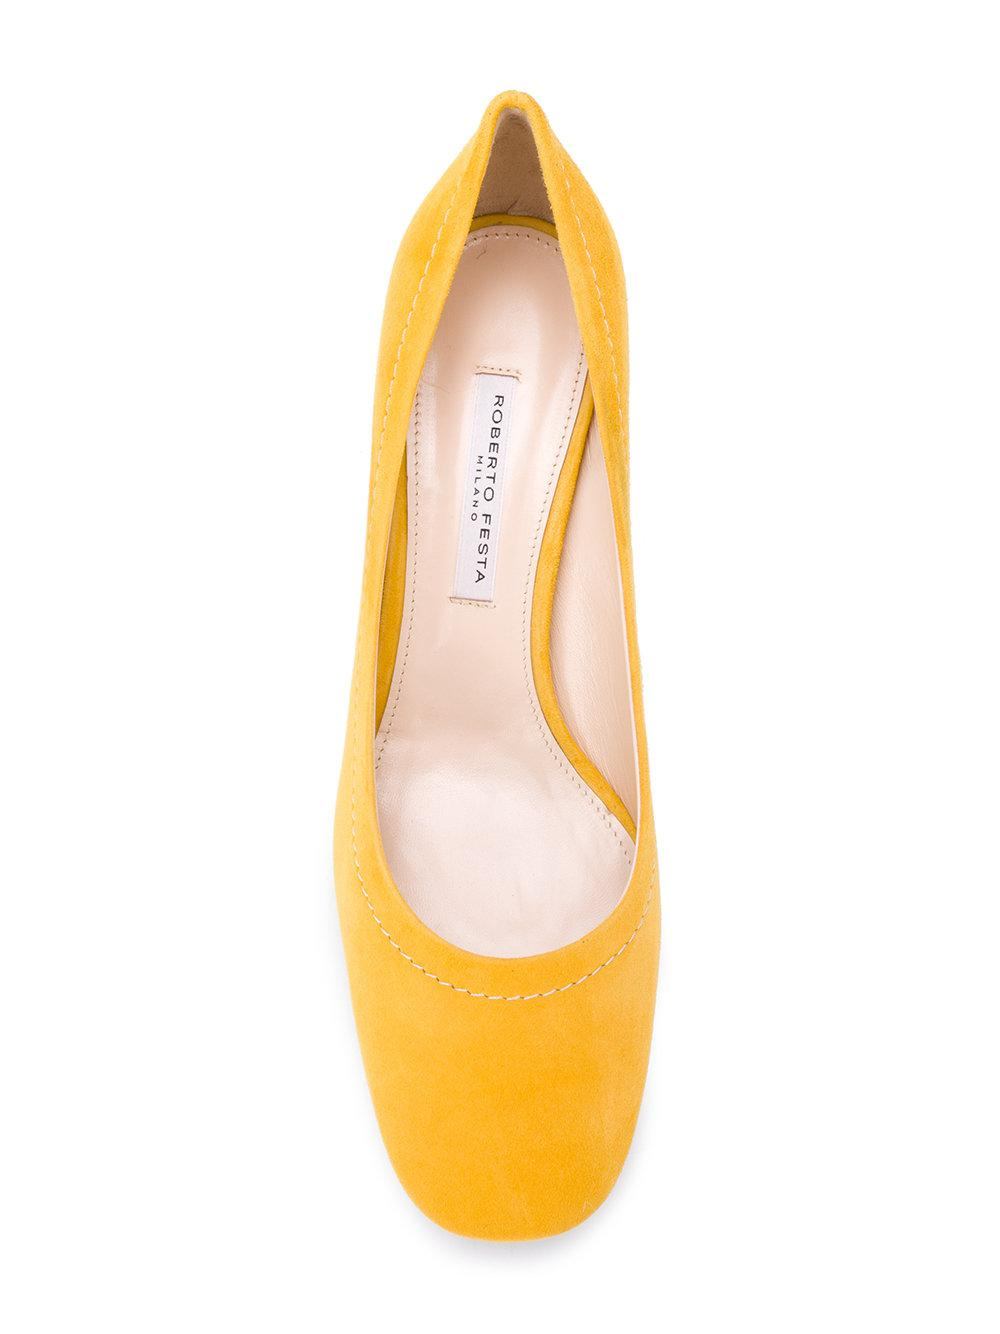 mid heel pumps - Yellow & Orange Roberto Festa Milano L9Keapw62r